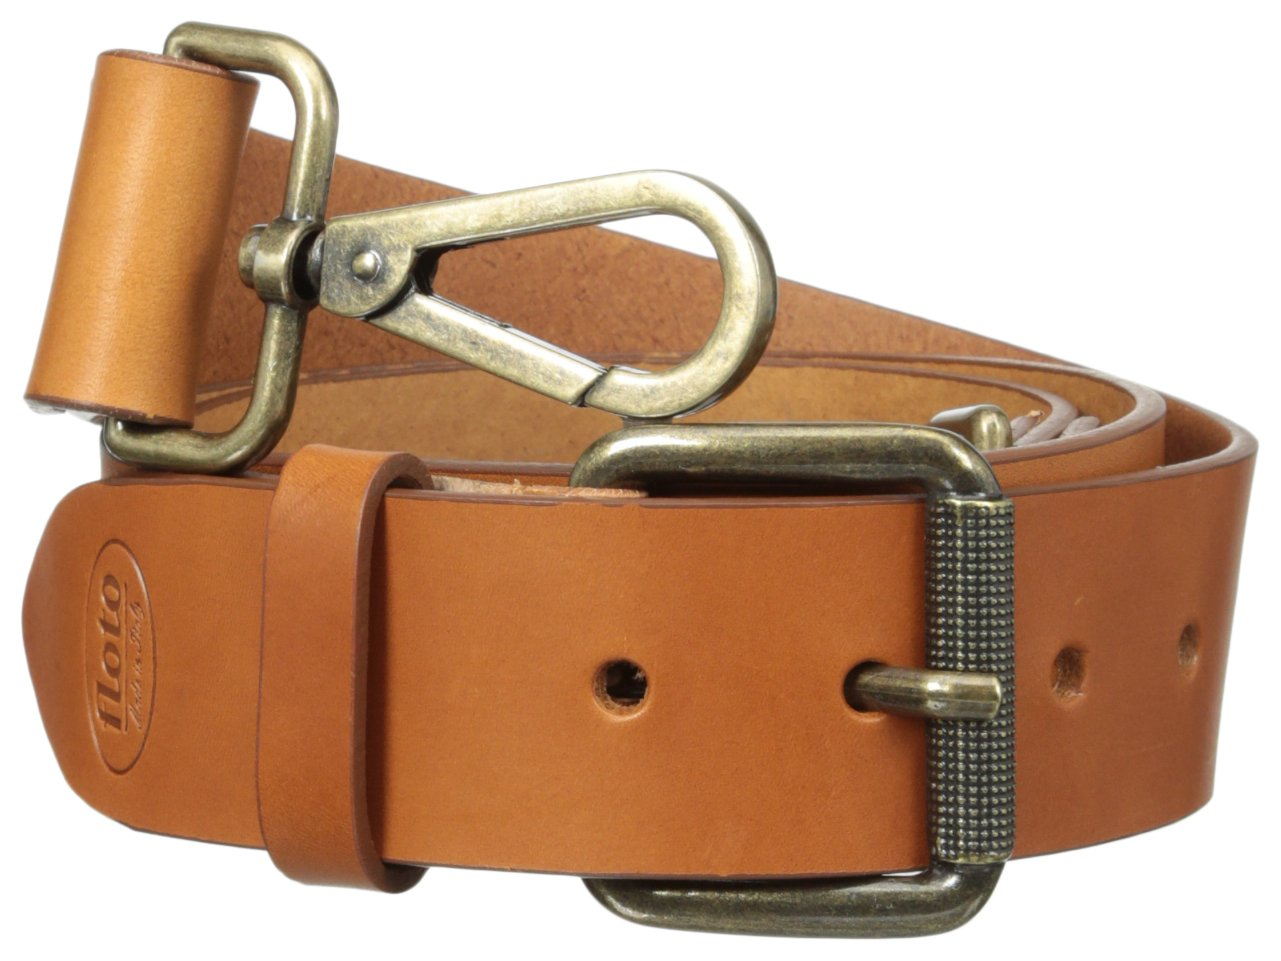 Floto Italian Calfskin Leather Belt Strap, Olive Brown, One Size